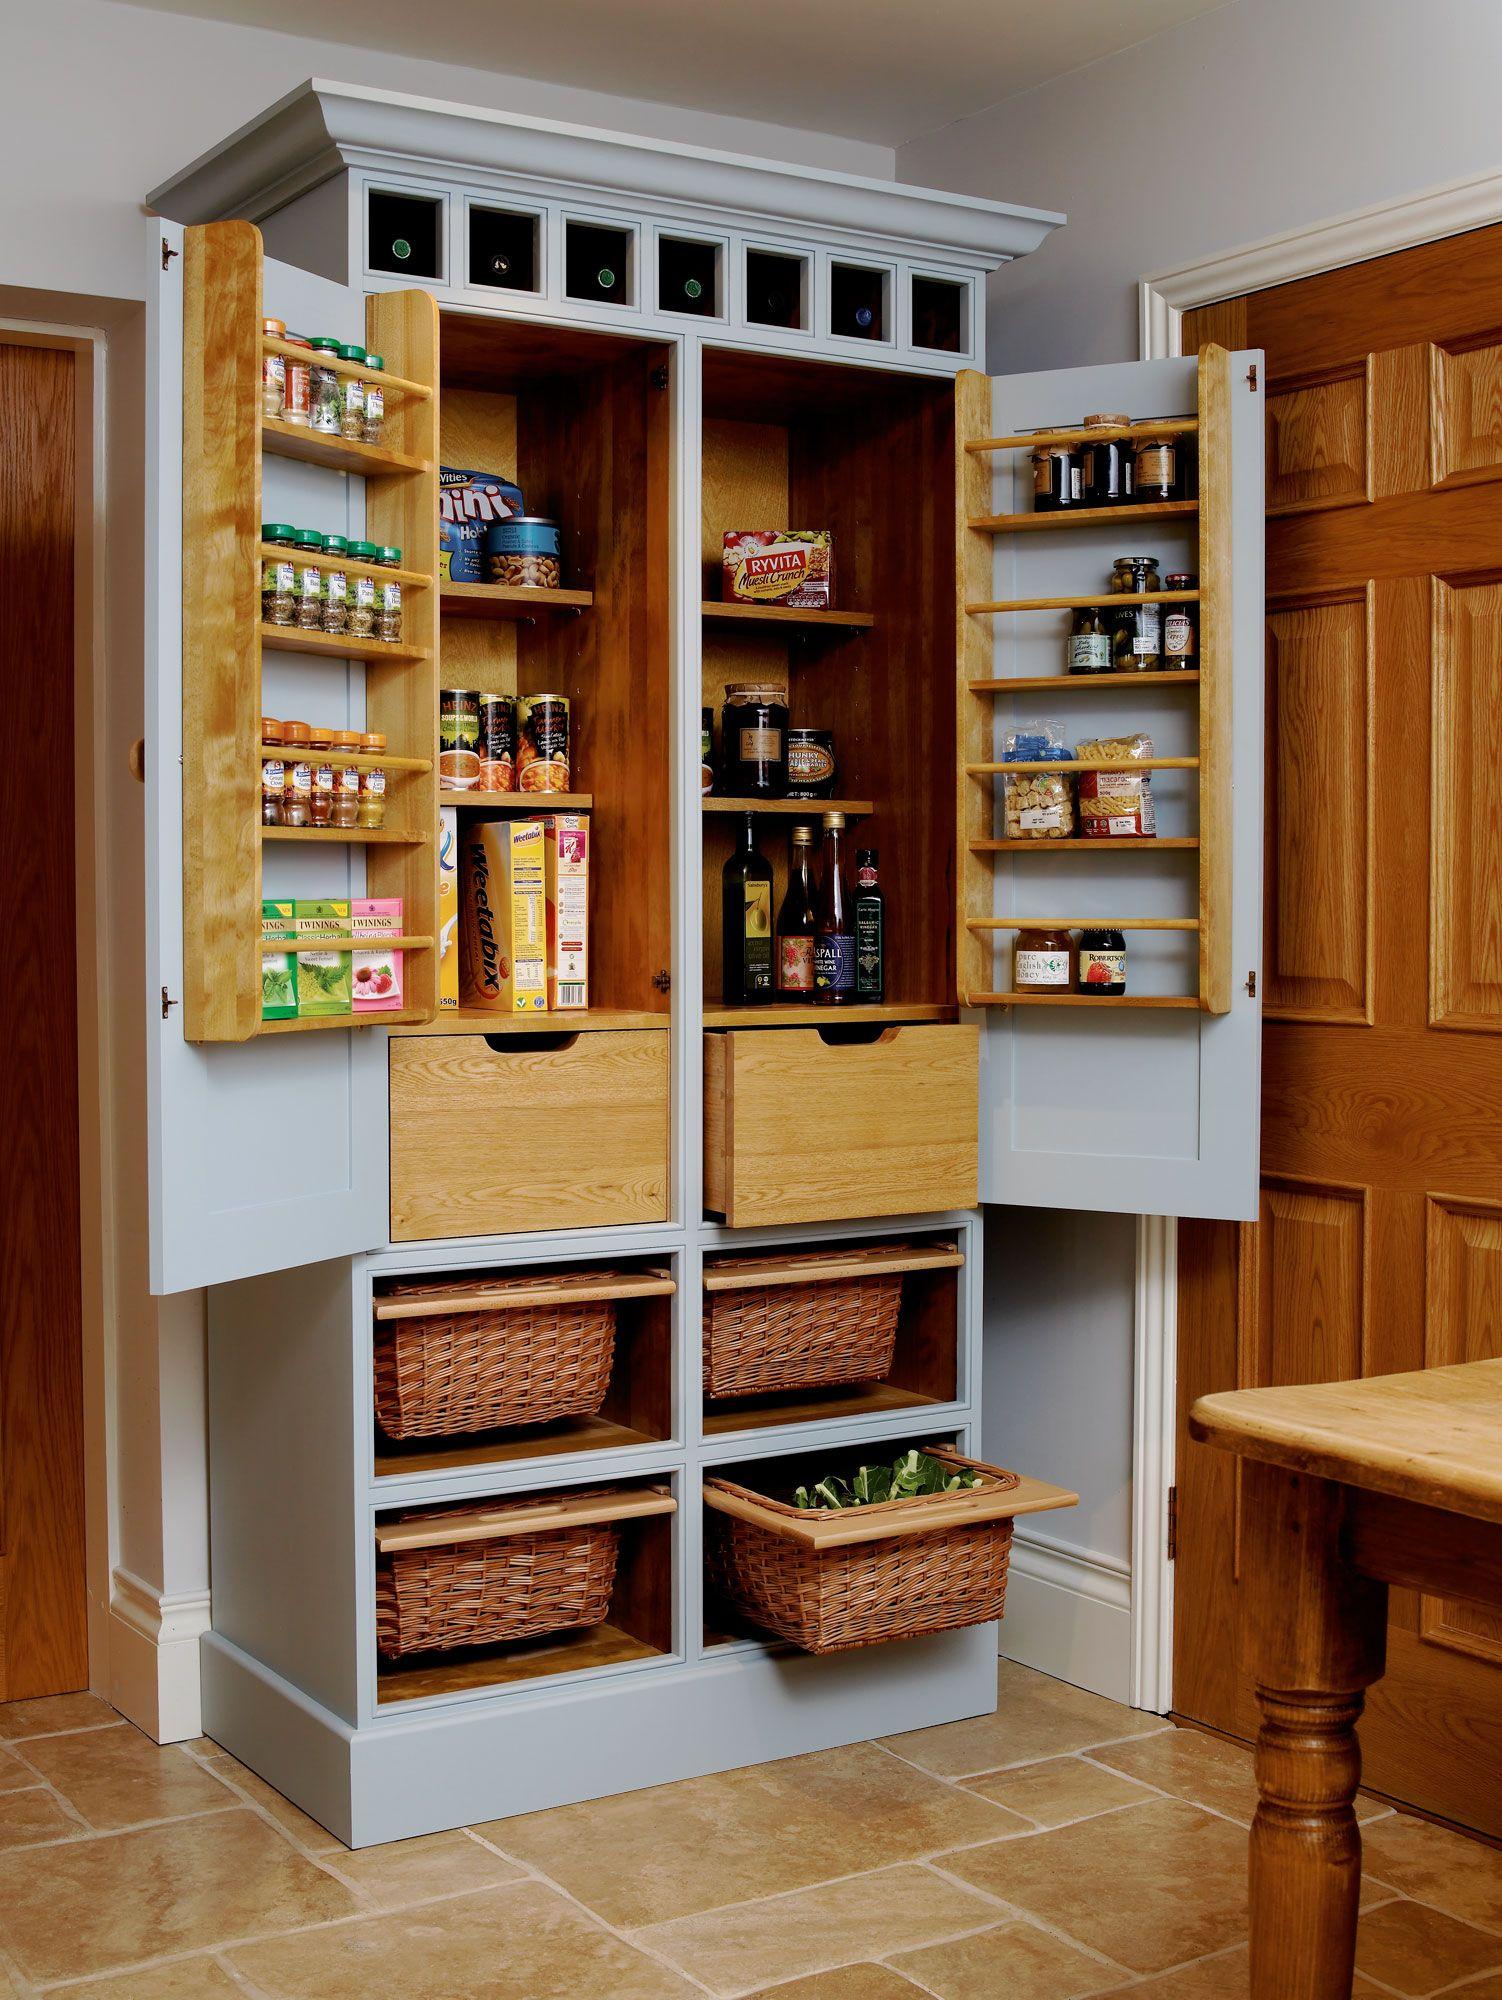 Pin By Yvonne Haworth On Kitchen Storage Pinterest Road Gear 1 Amplifier Head Cabinet Hitam Larder Cupboard With Wooden Insides